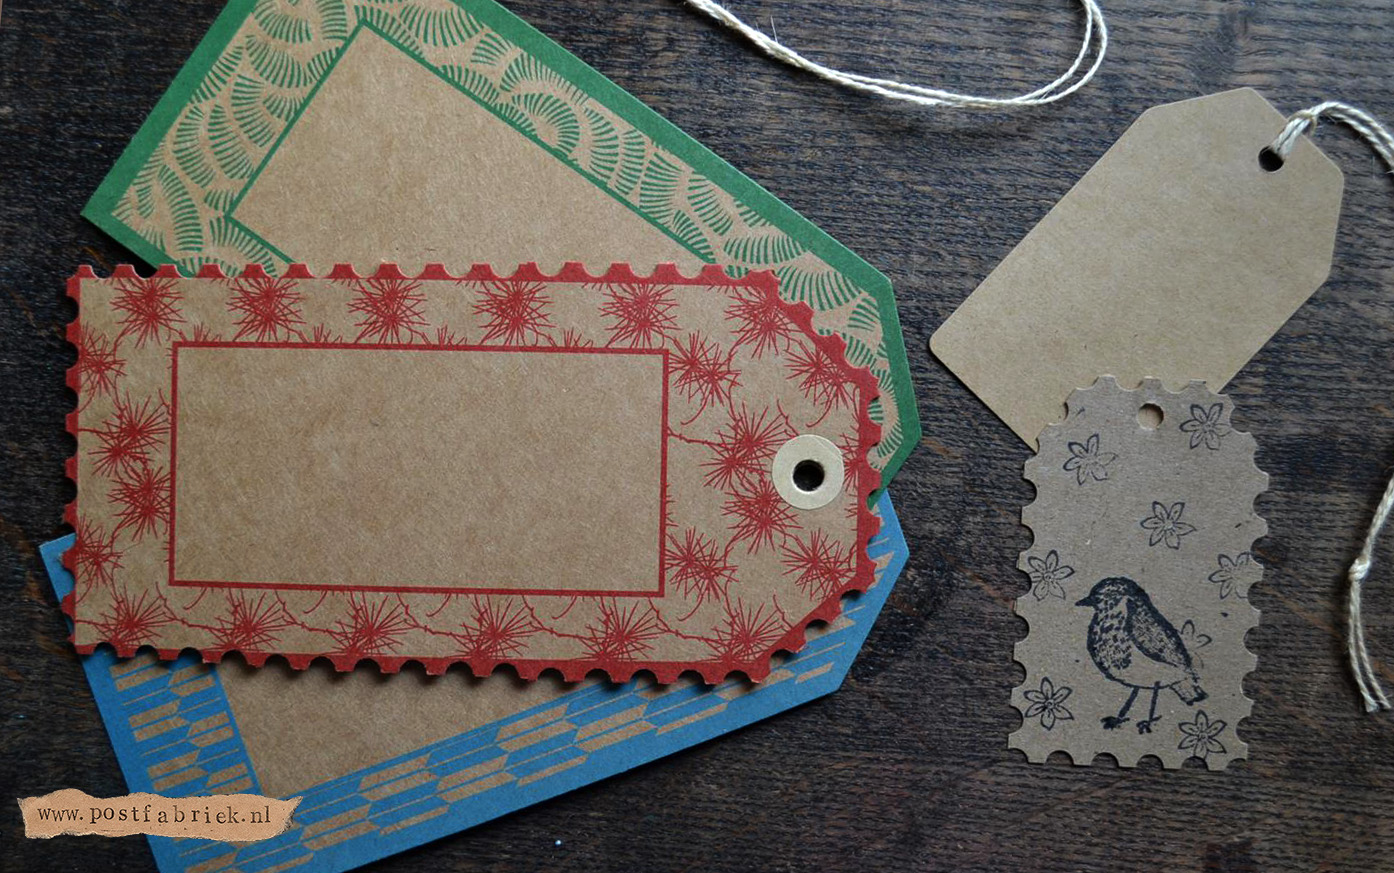 Postzegelrand 33